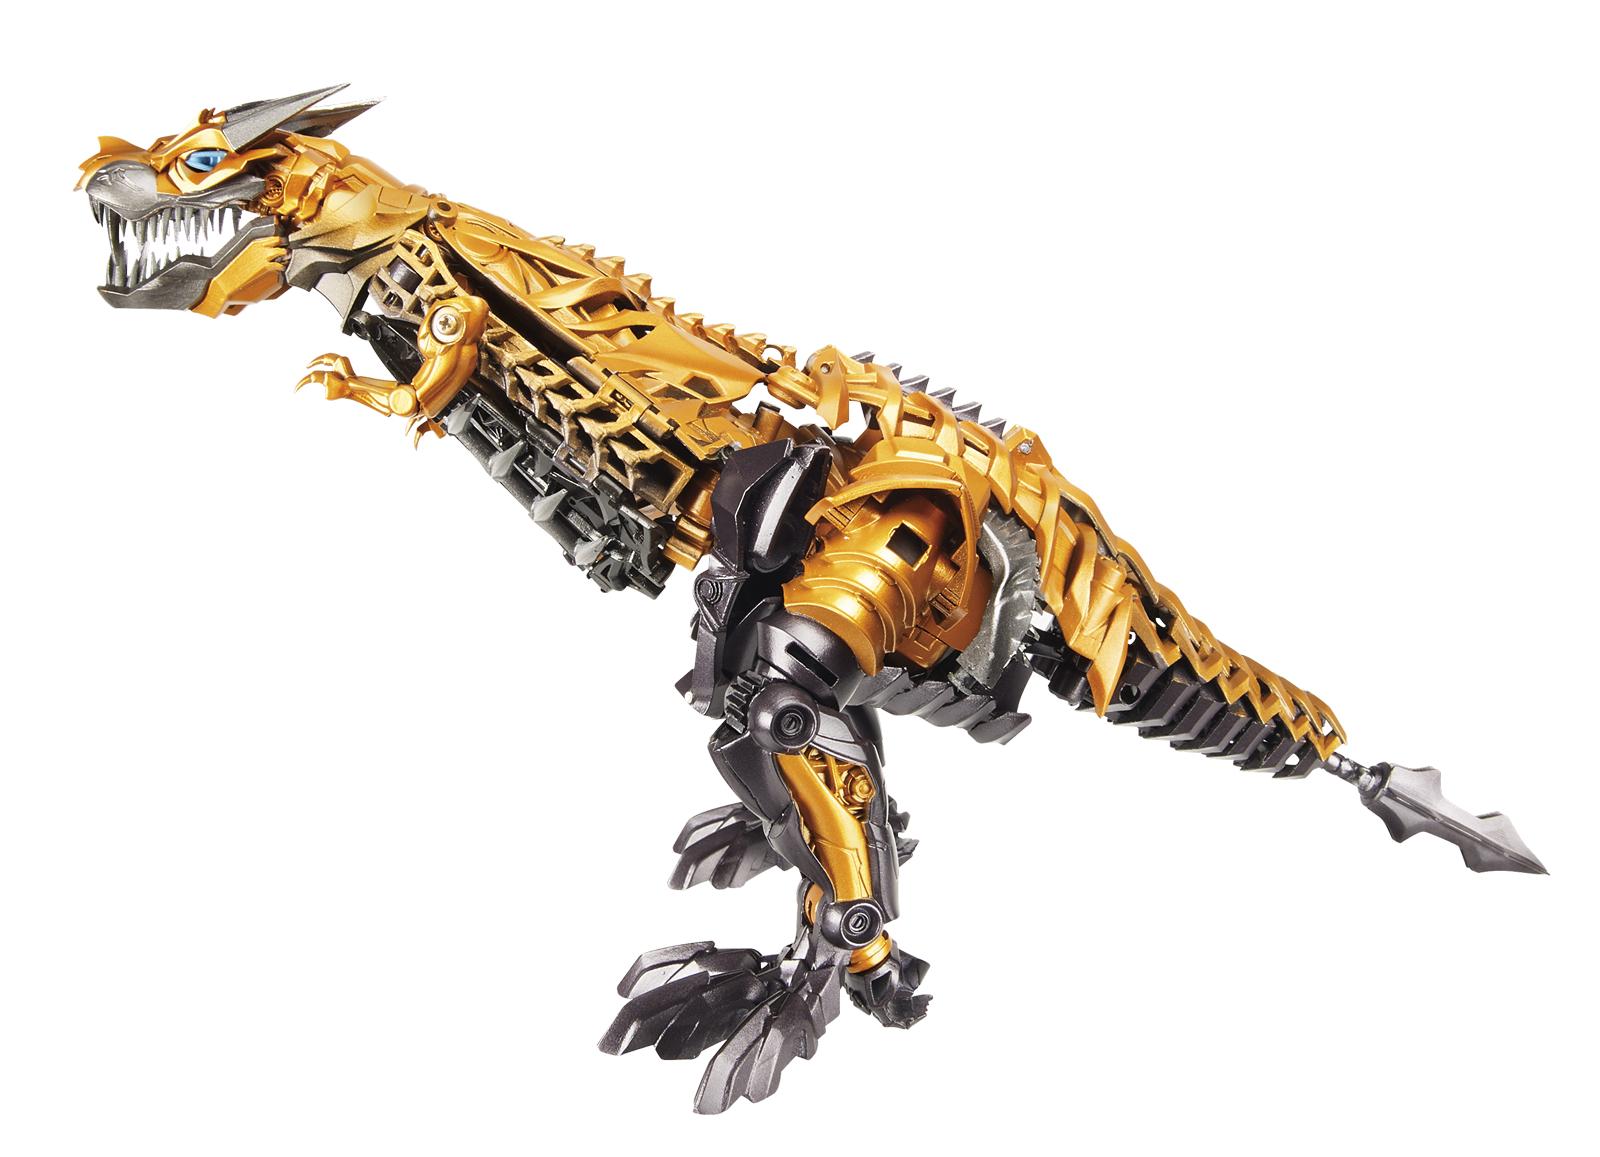 Transformers Studio Series: Age Of Extinction: Action ... |Transformer 4 Age Of Extinction Grimlock